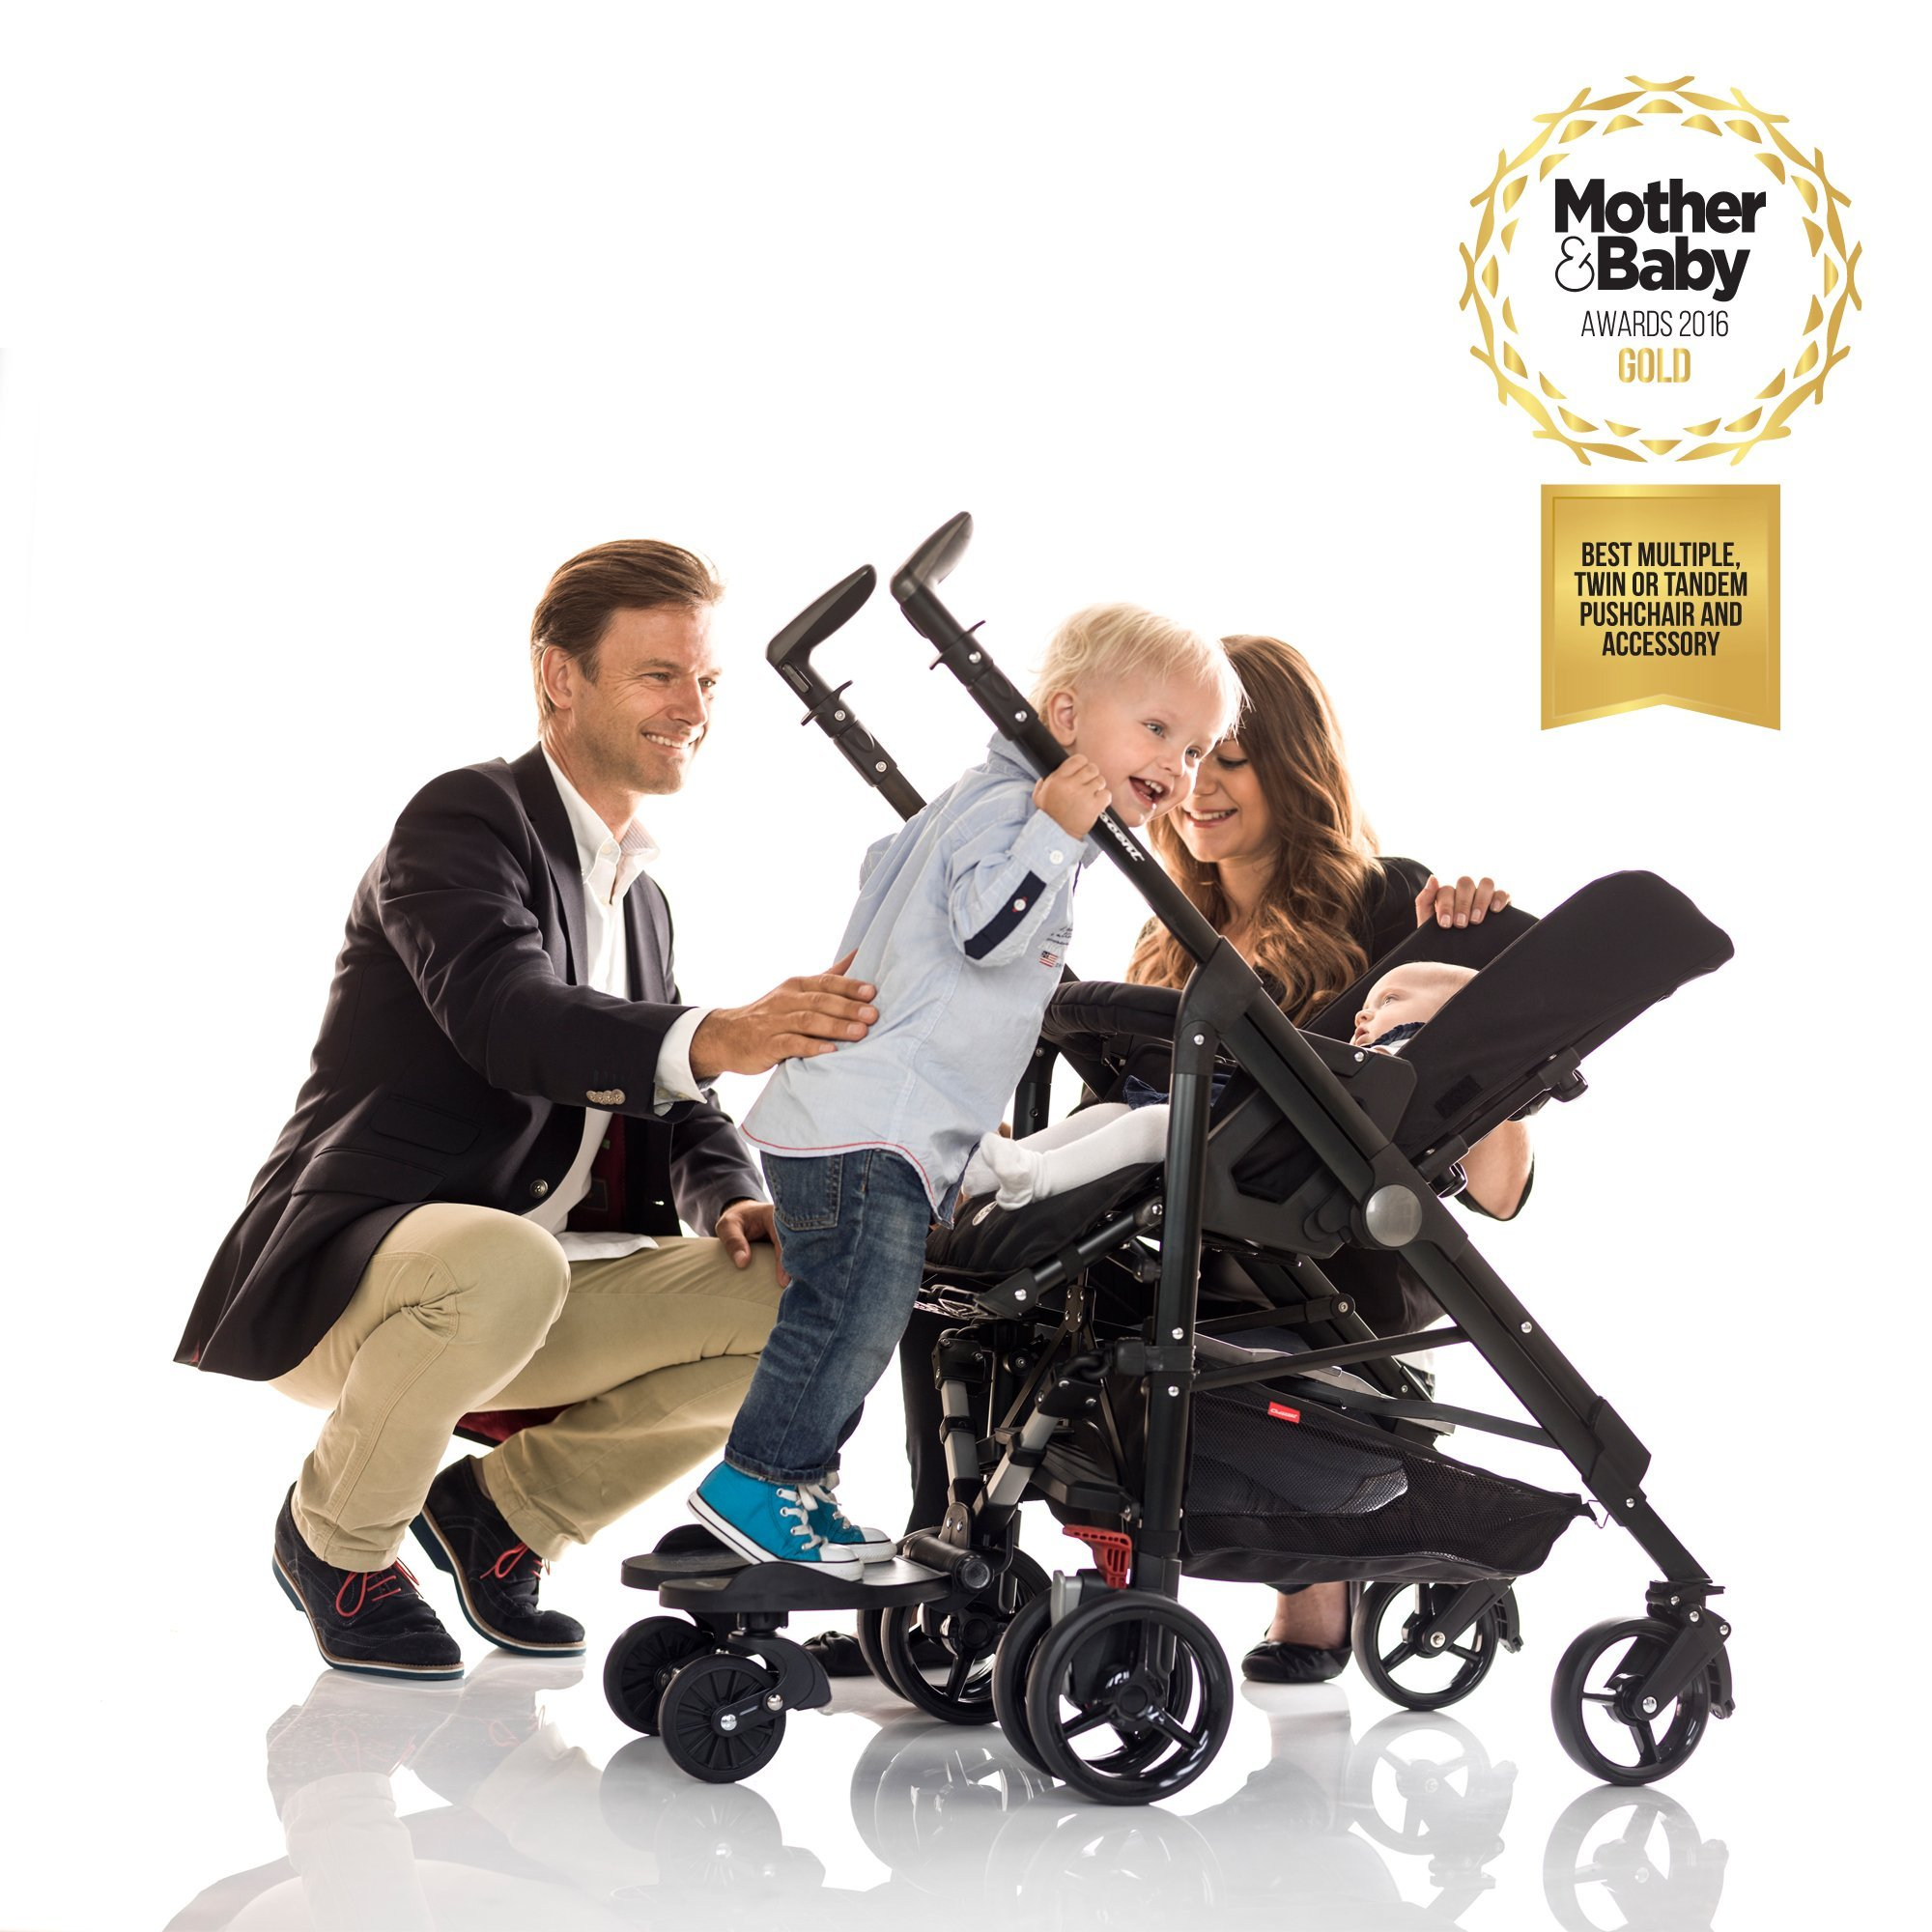 Toddler Board for Prams & Strollers (Black) - 2 - 5 Years